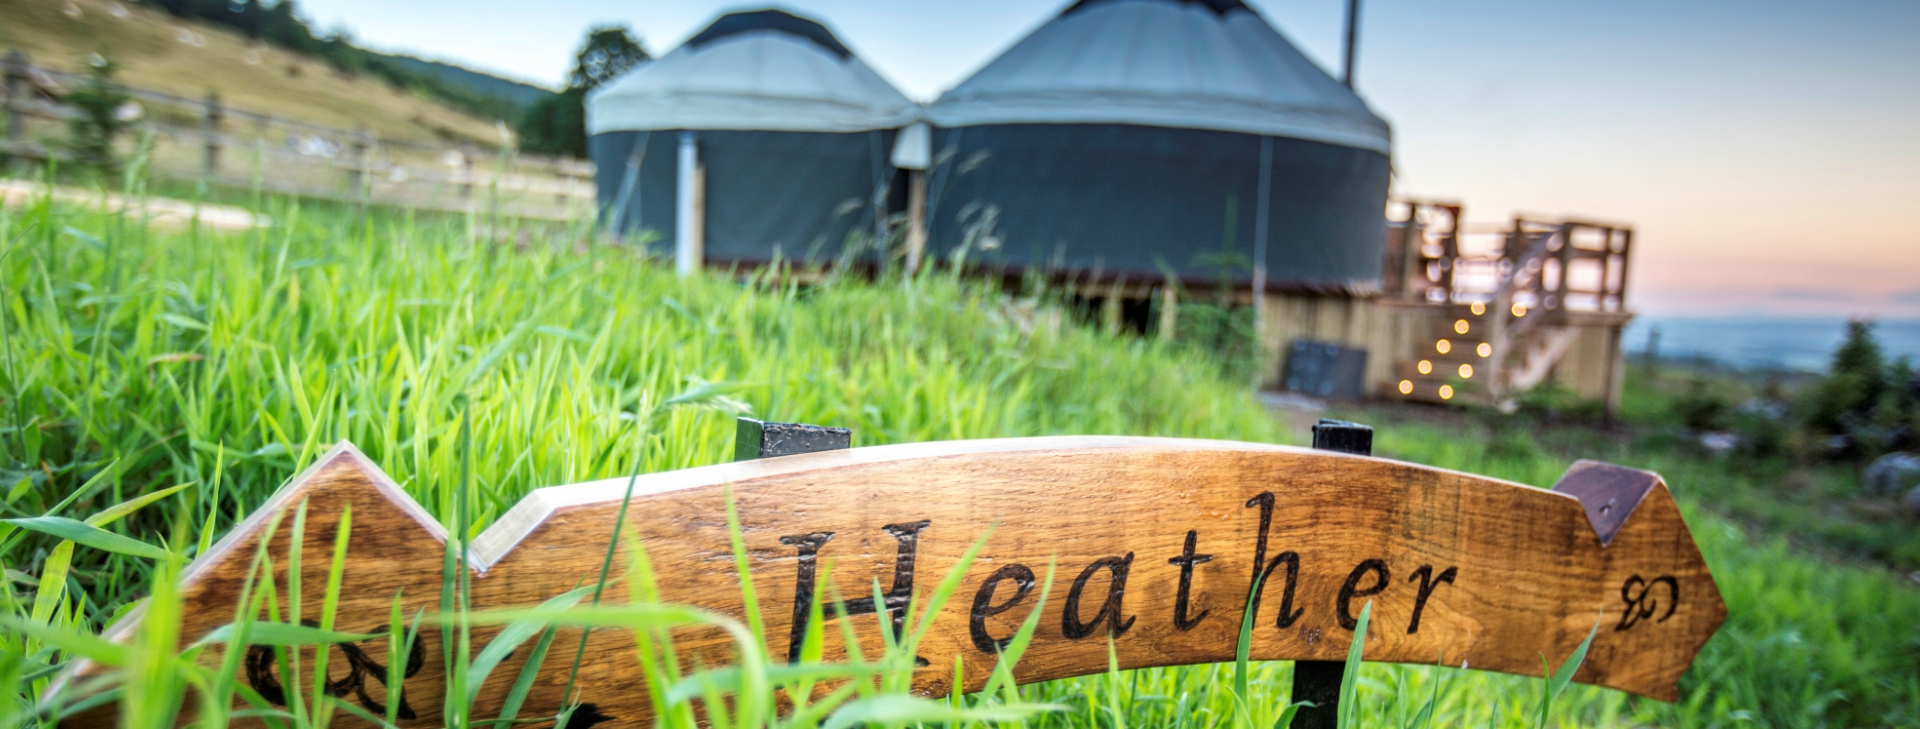 Yurt Luxury Glamping with Hot Tub | Near Gleneagles Perthshire | Yurt Heather